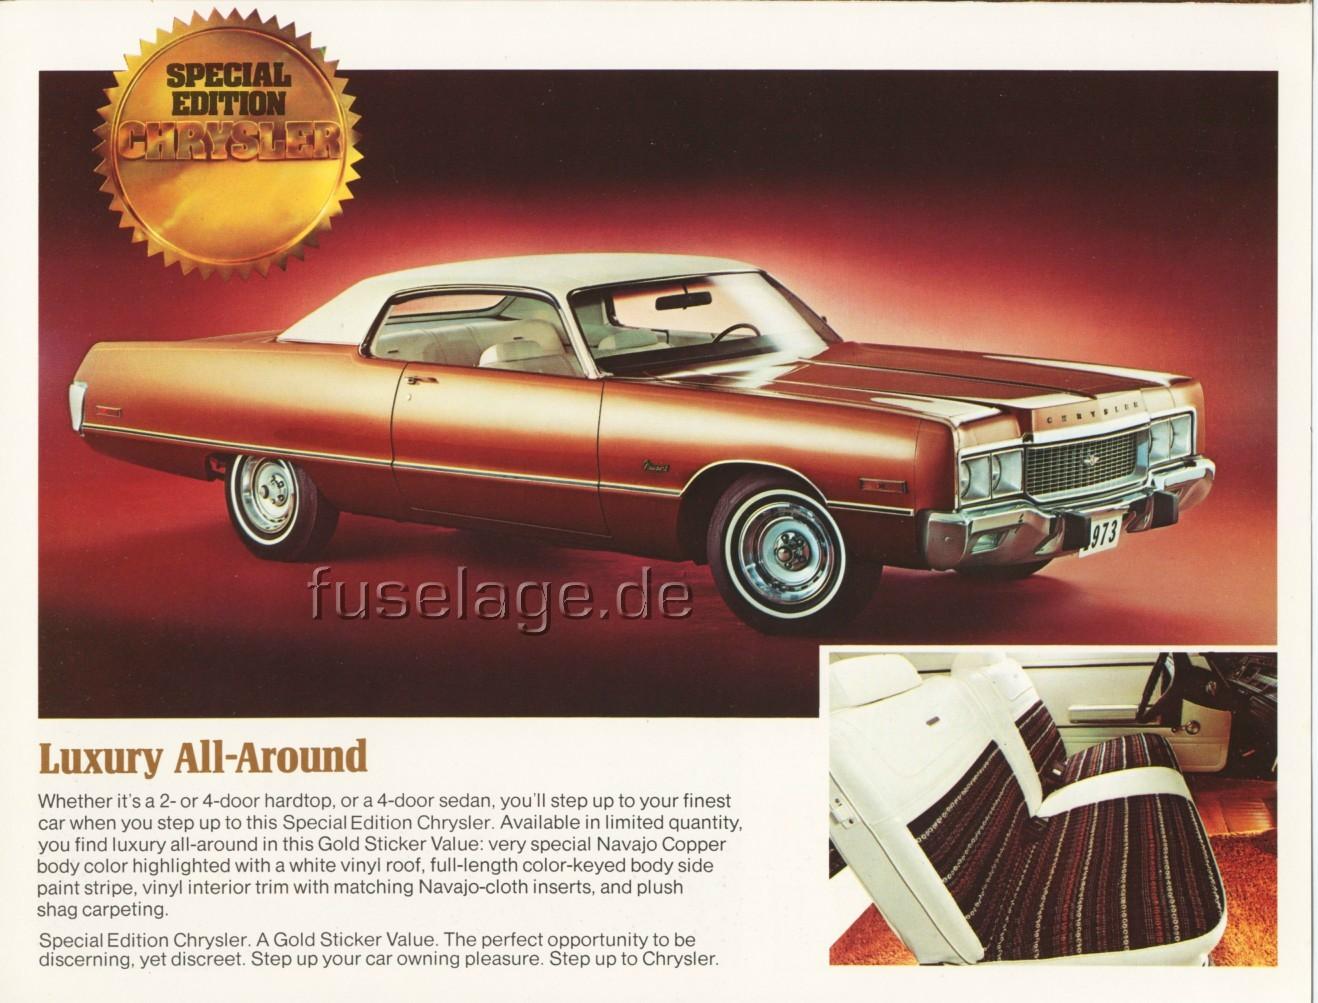 1973 Chrysler Gold Sticker Special